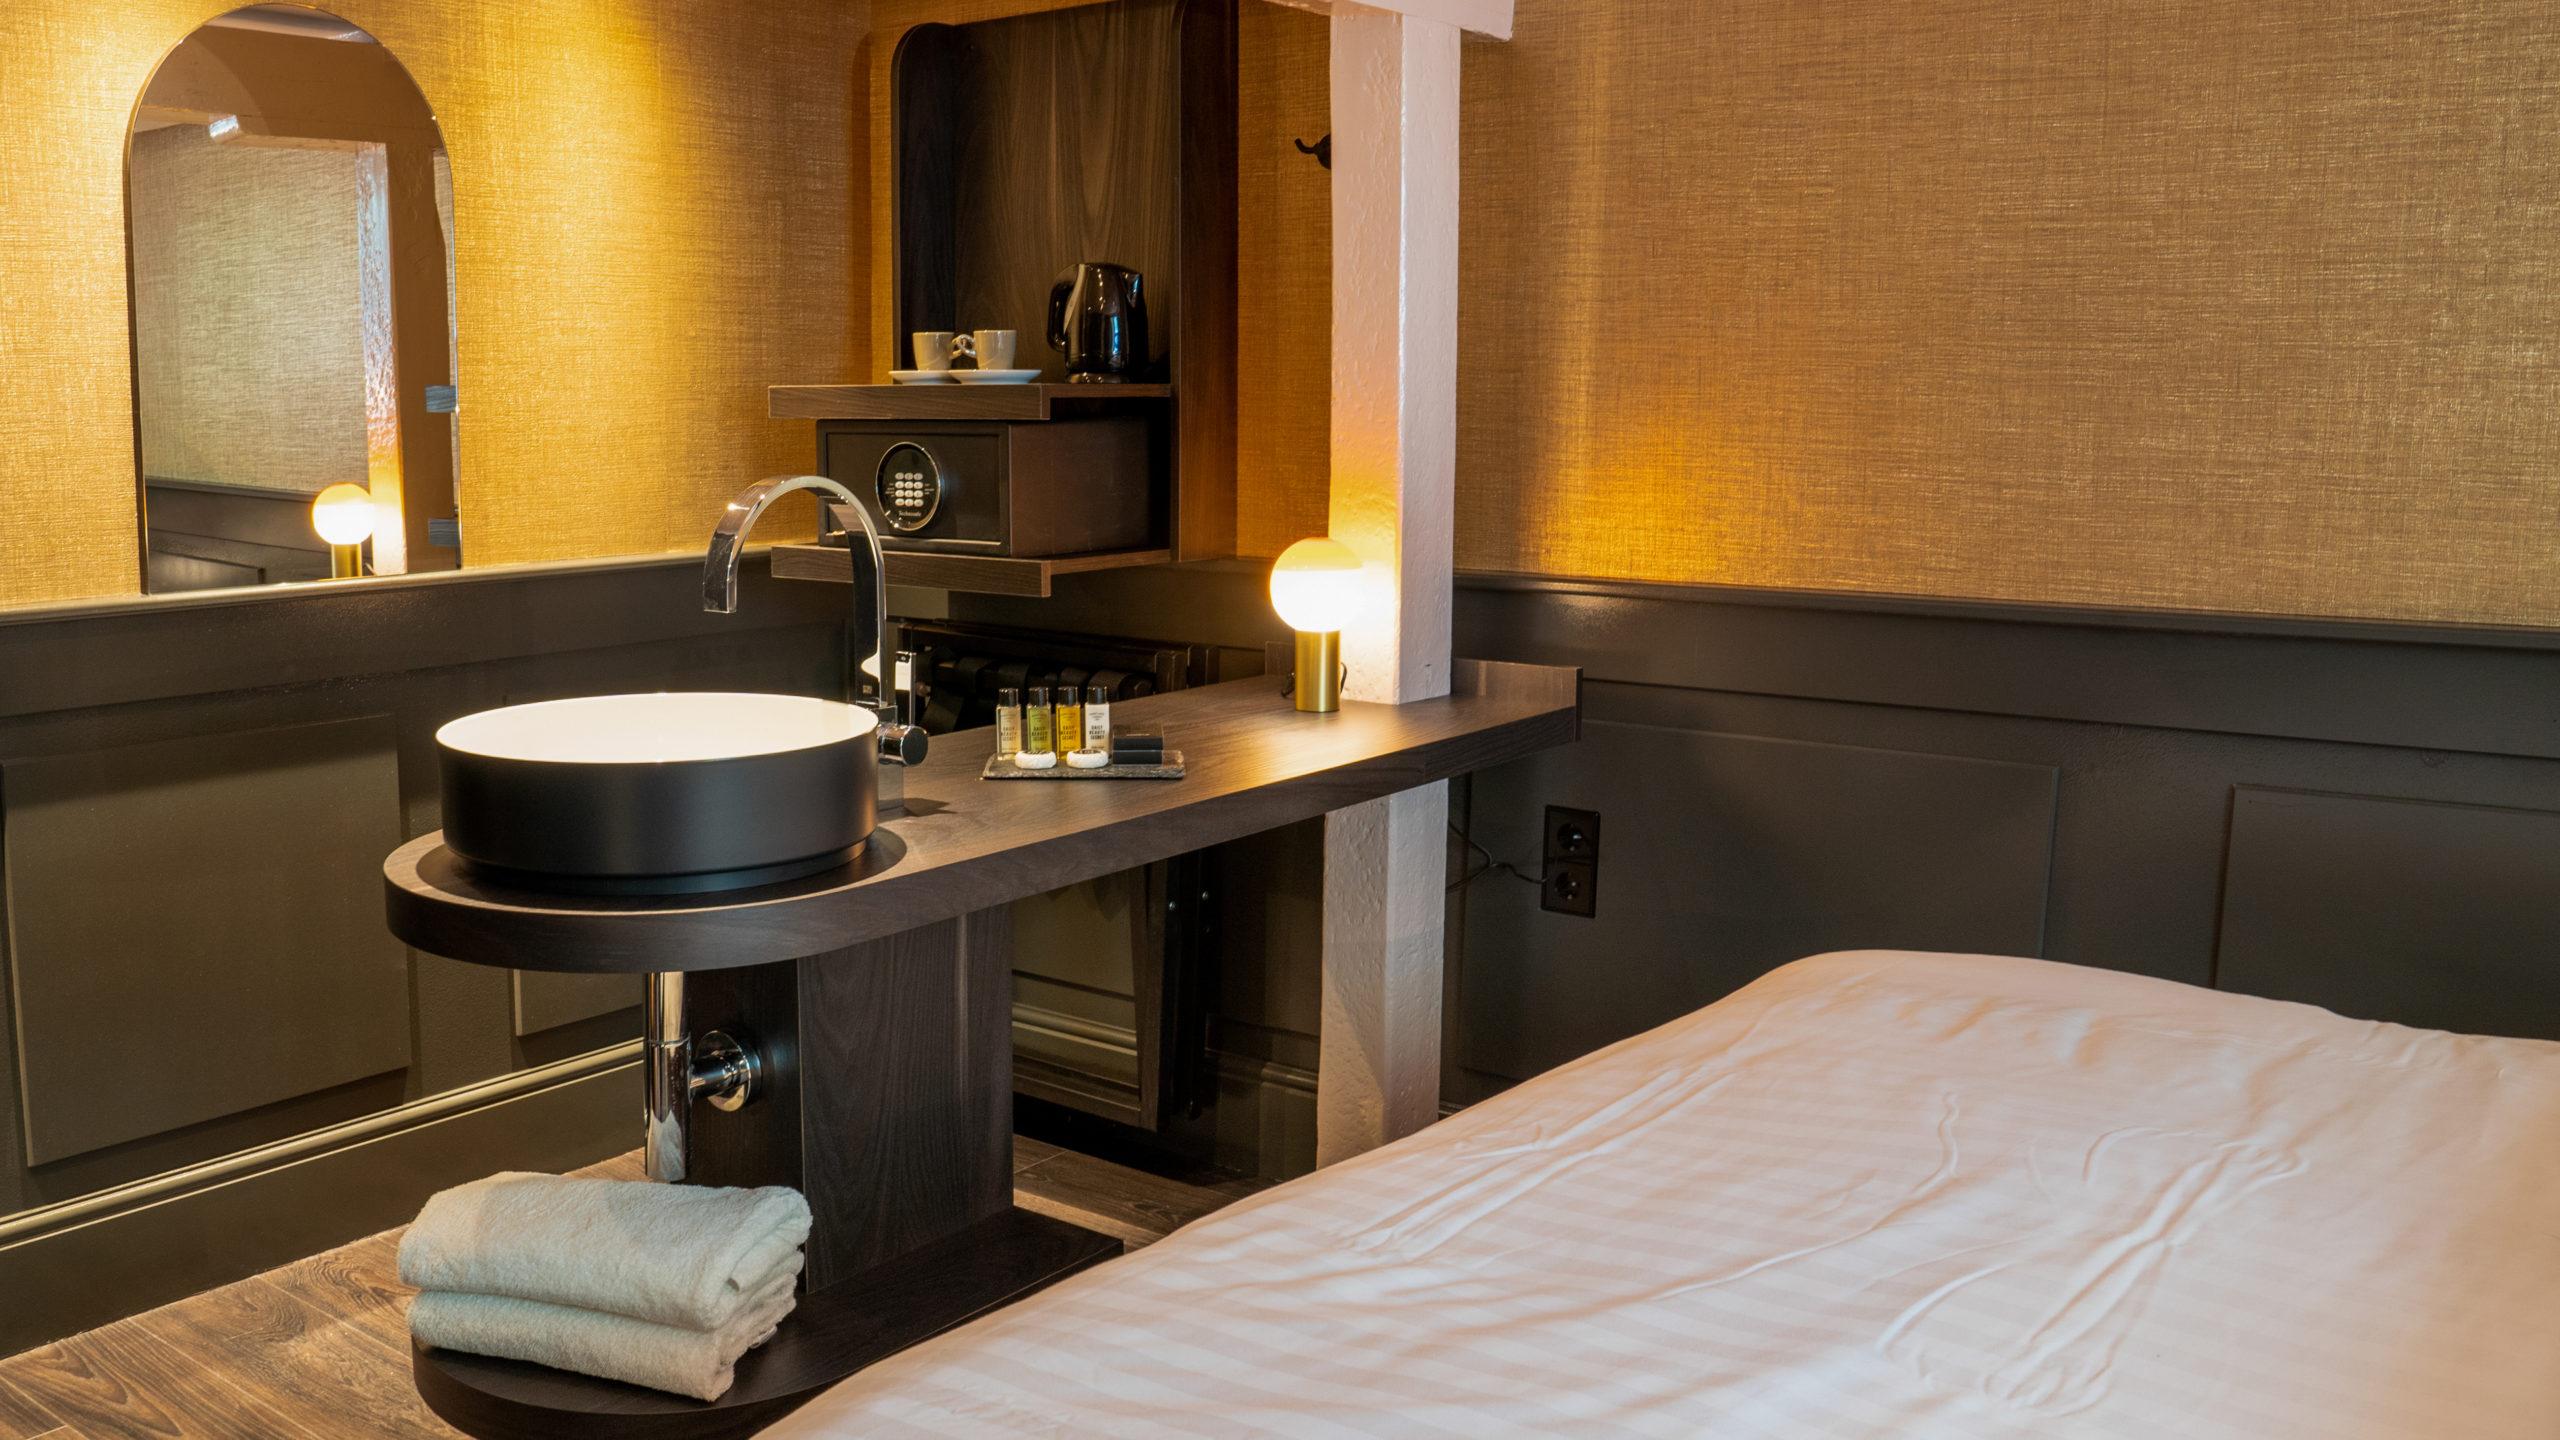 hotel_1666_thorbecke_jeroendenijs_bni_amsterdam_suite_boutique_island